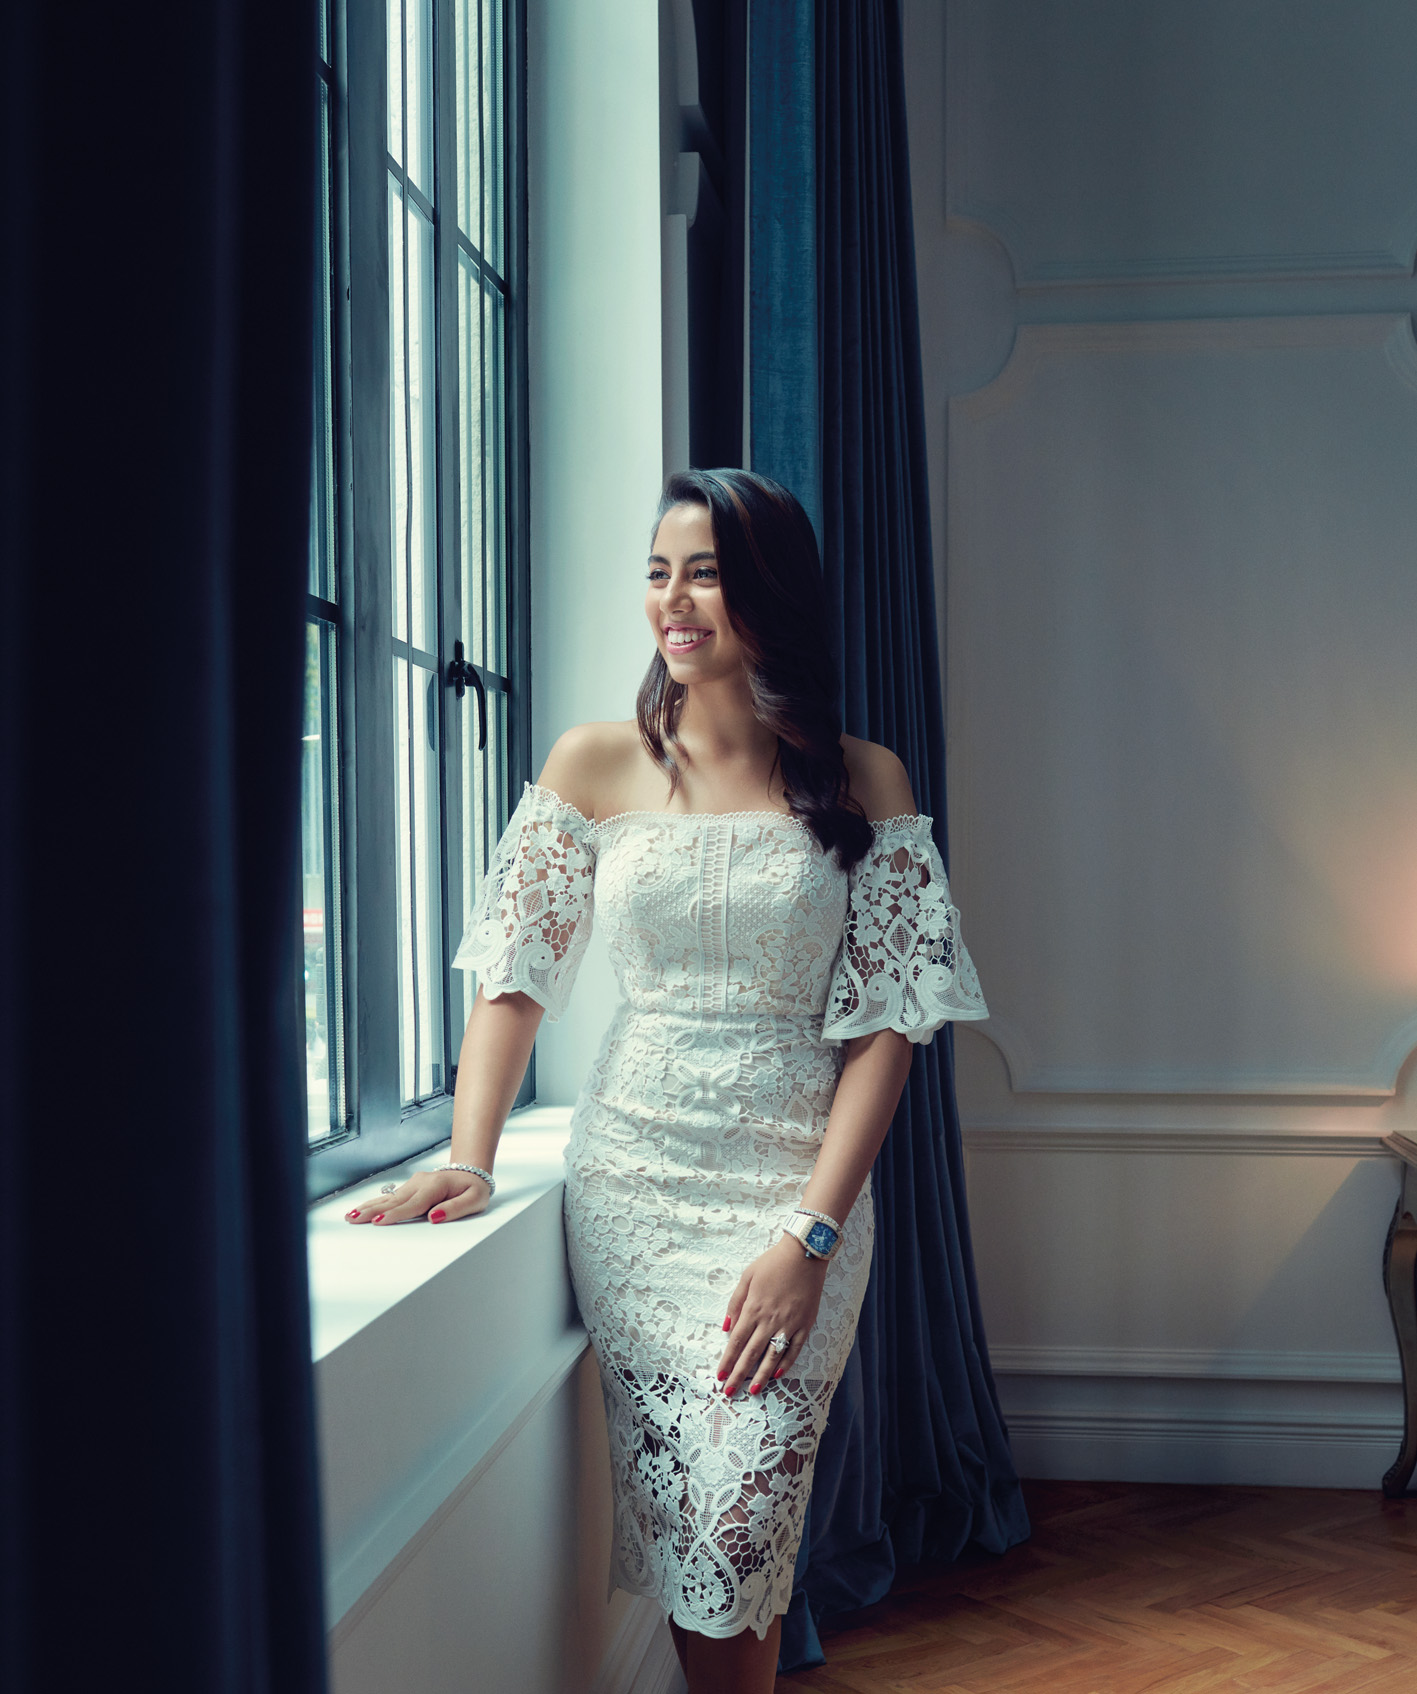 Shaila Tanwani takes on the #PrestigeQuestionnaire